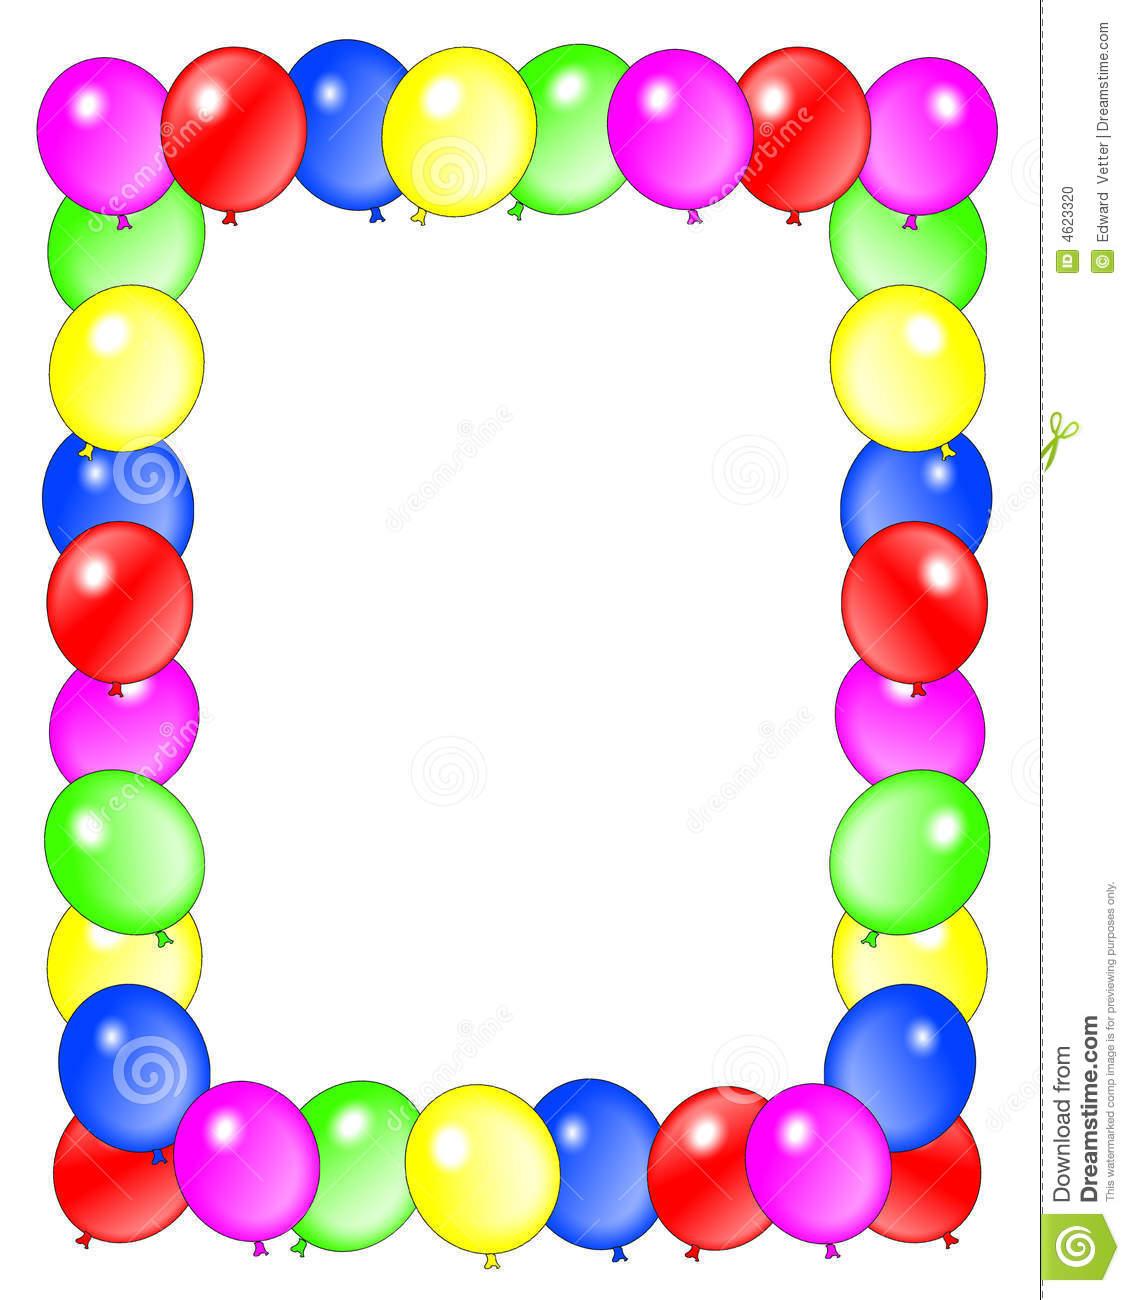 ... -art-borders-and-frames-clipart-panda-free-clipart-5PFAFg-clipart.jpg